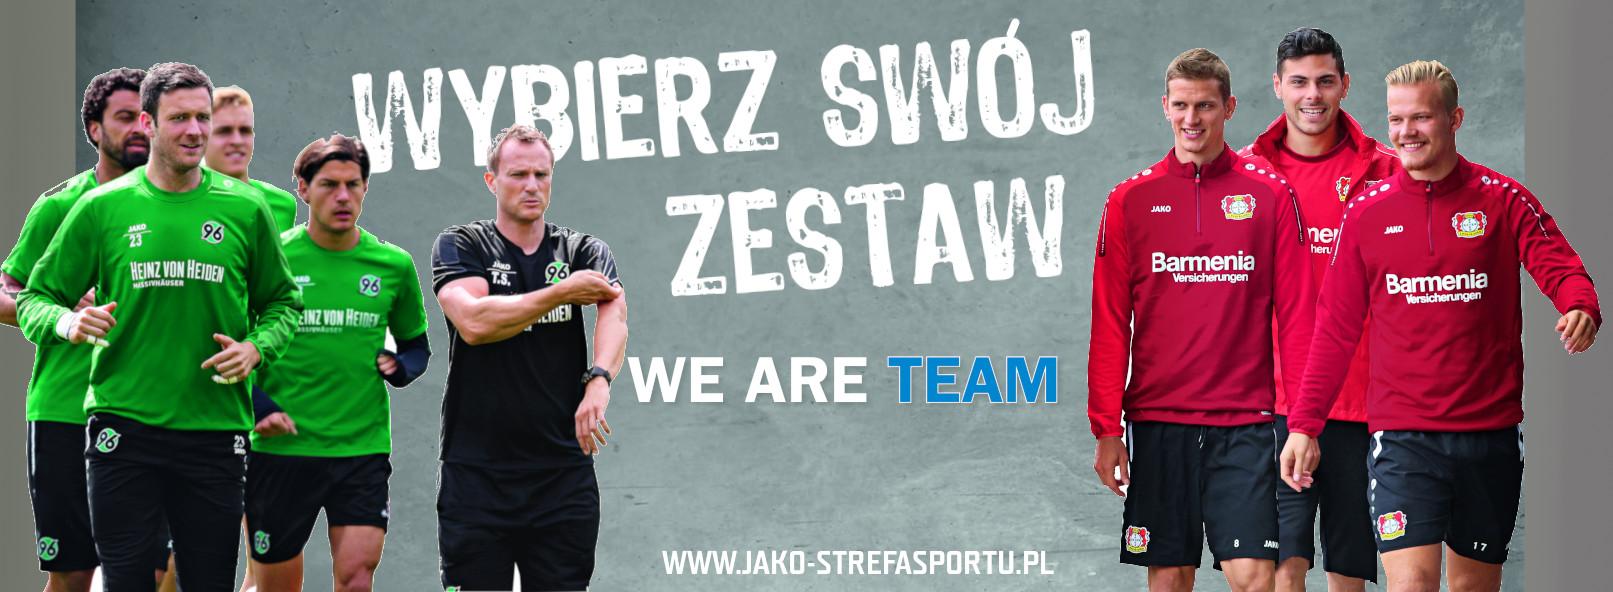 ZESTAW2